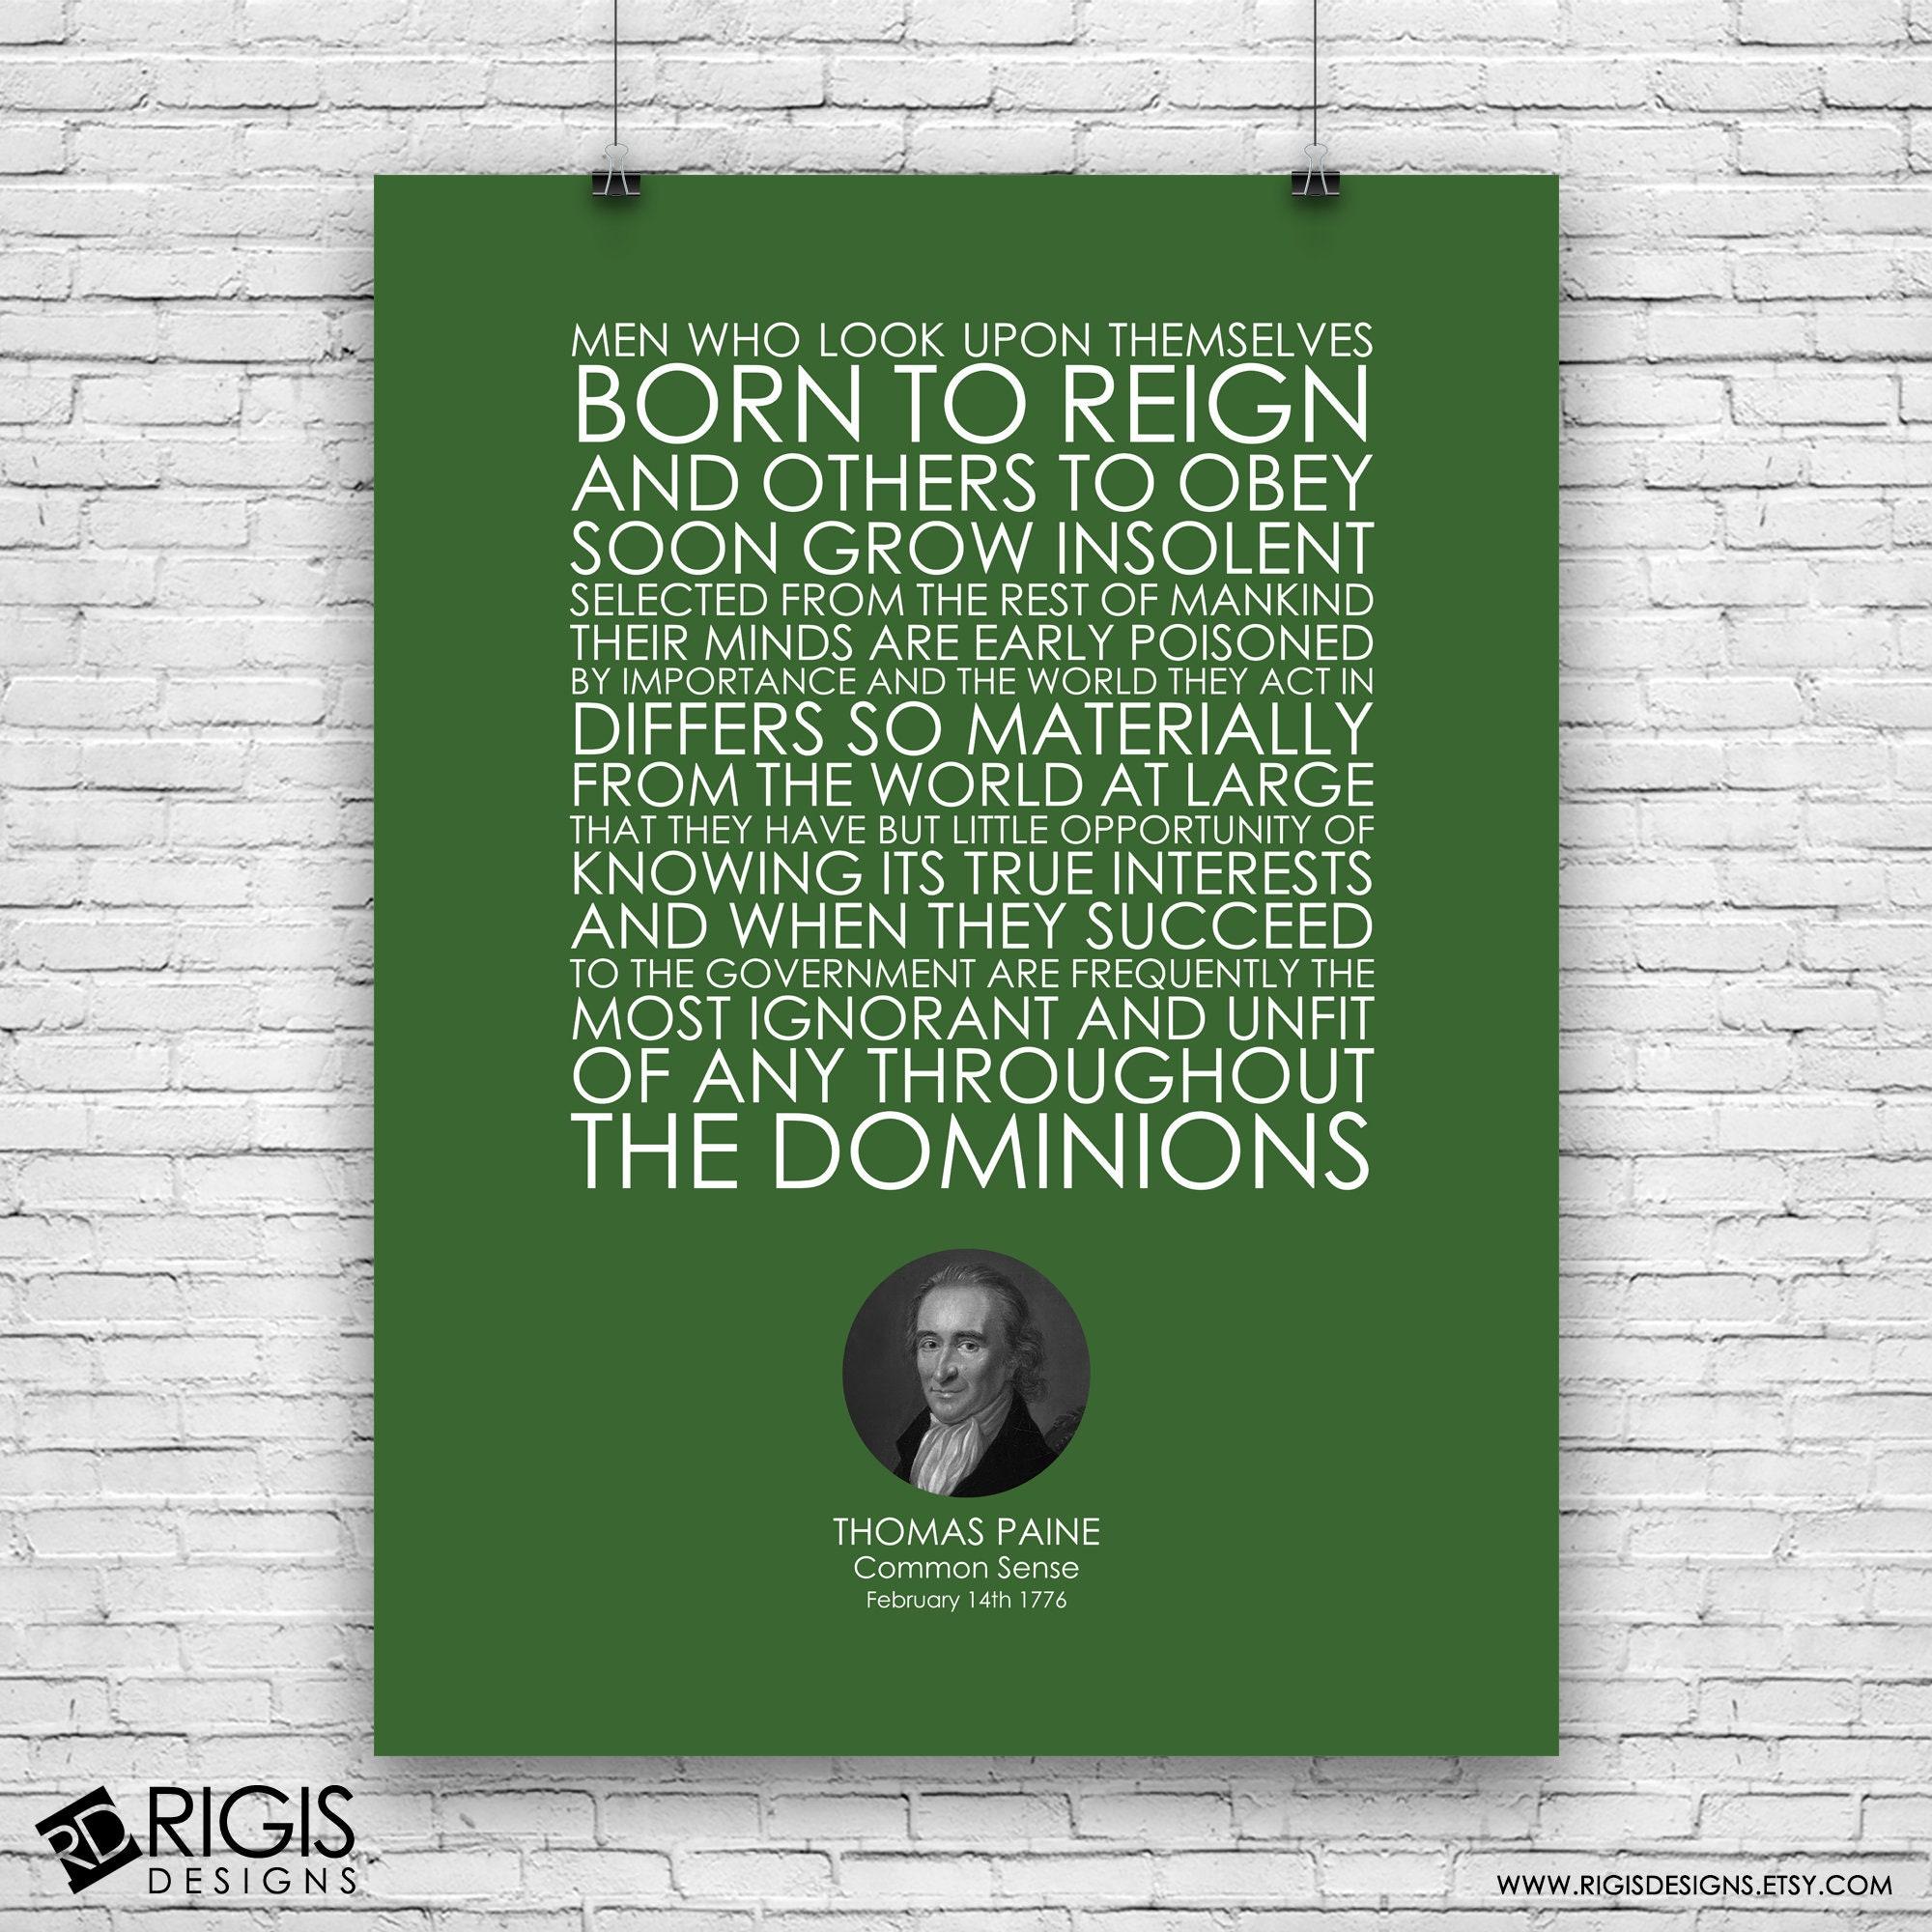 Thomas Paine, Common Sense Speech